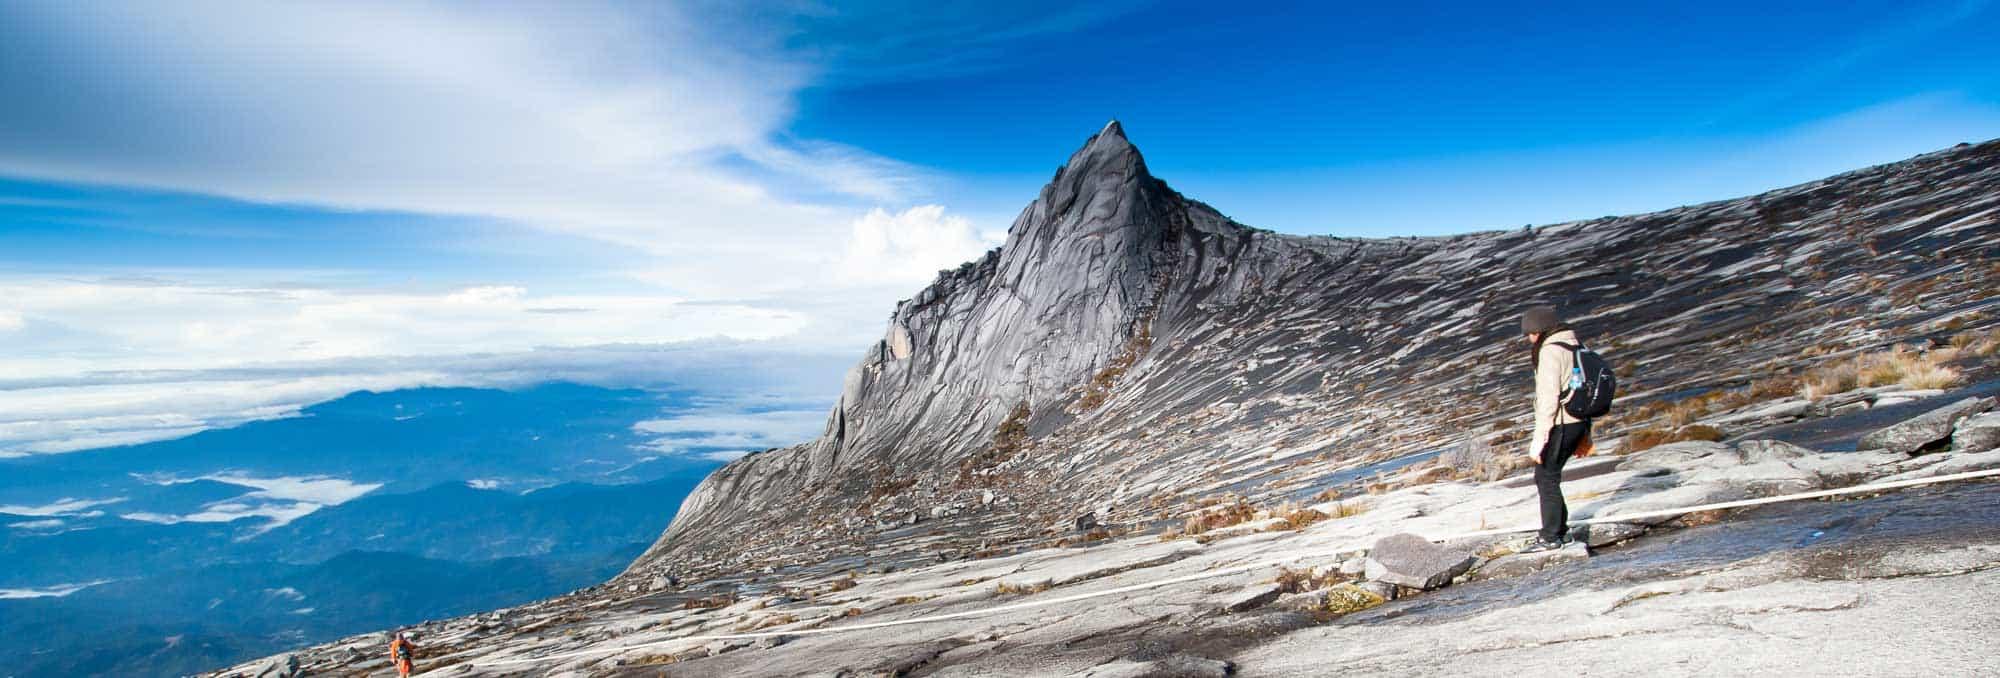 Mt Kinabalu, Malaysia